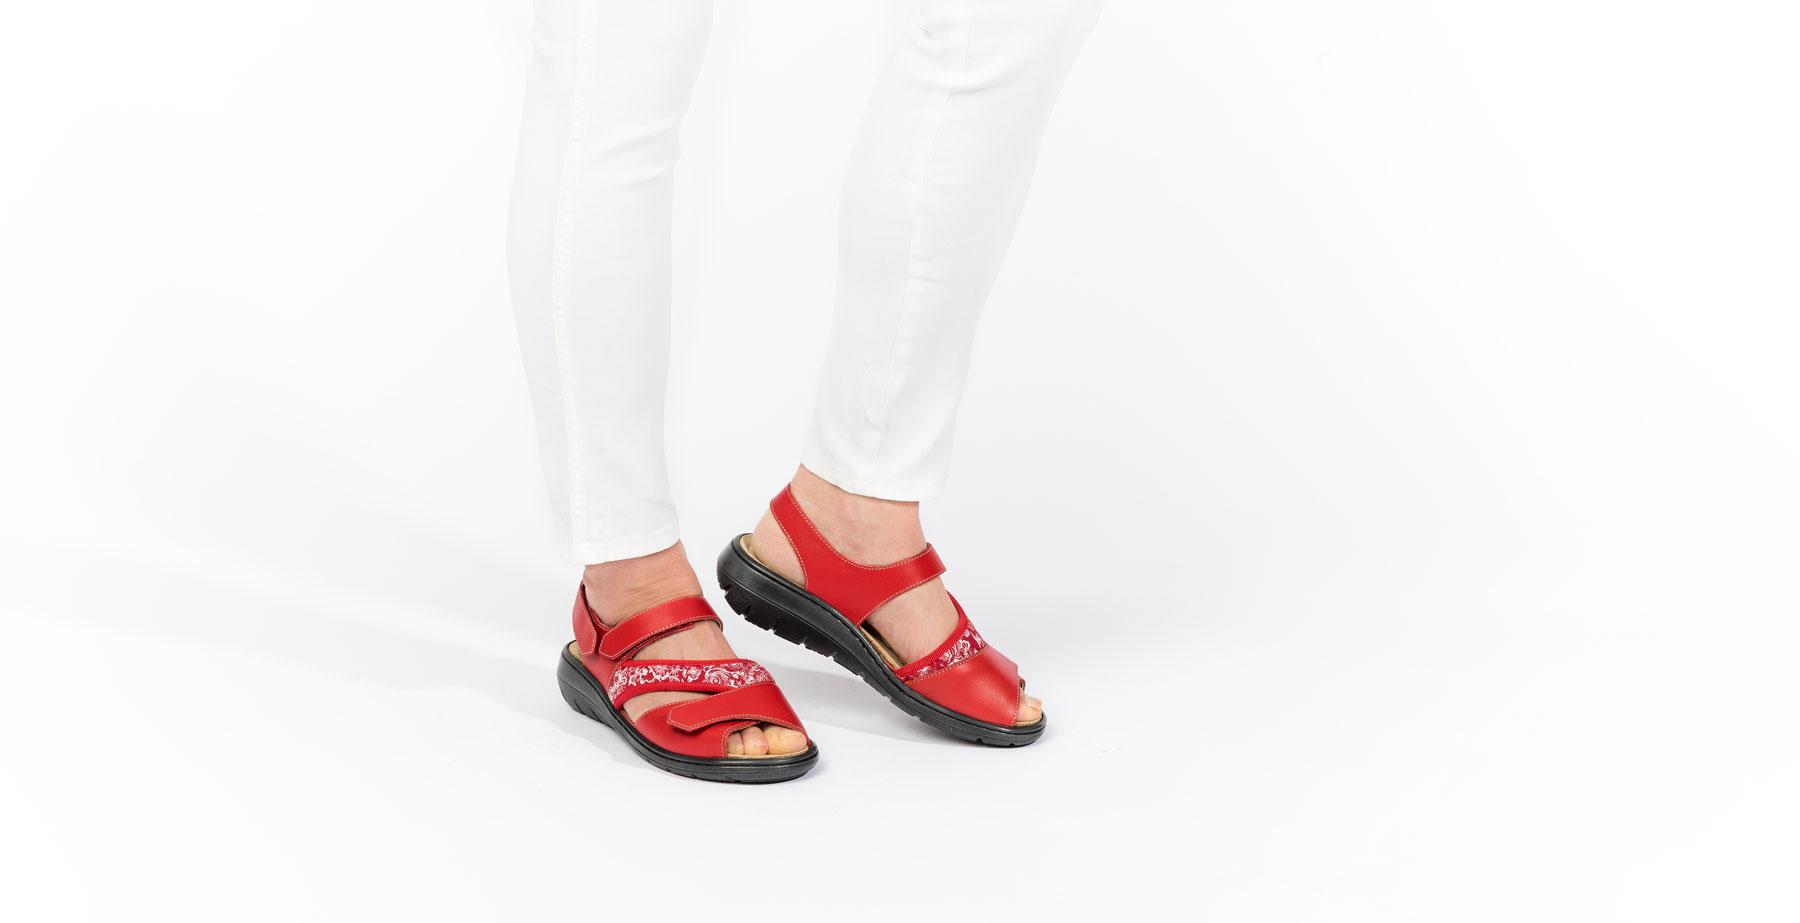 packshot studio chaussure podo